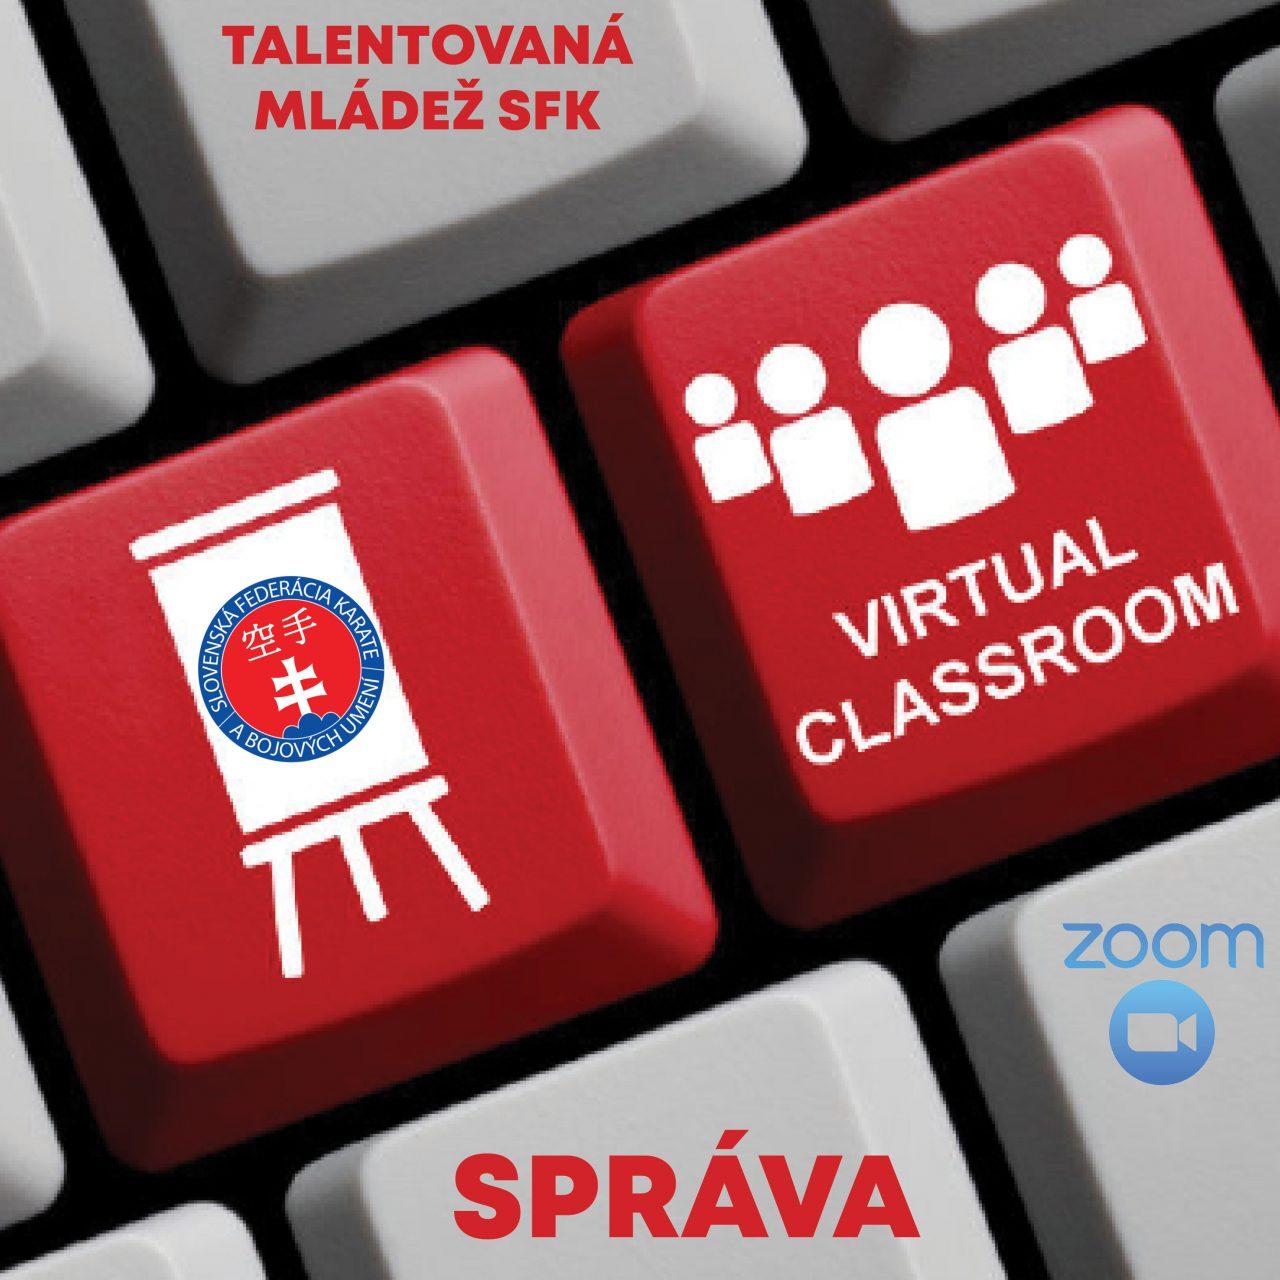 https://karate-slovakia.sk/wp-content/uploads/online-treningy_tm_sprava-1280x1280.jpg